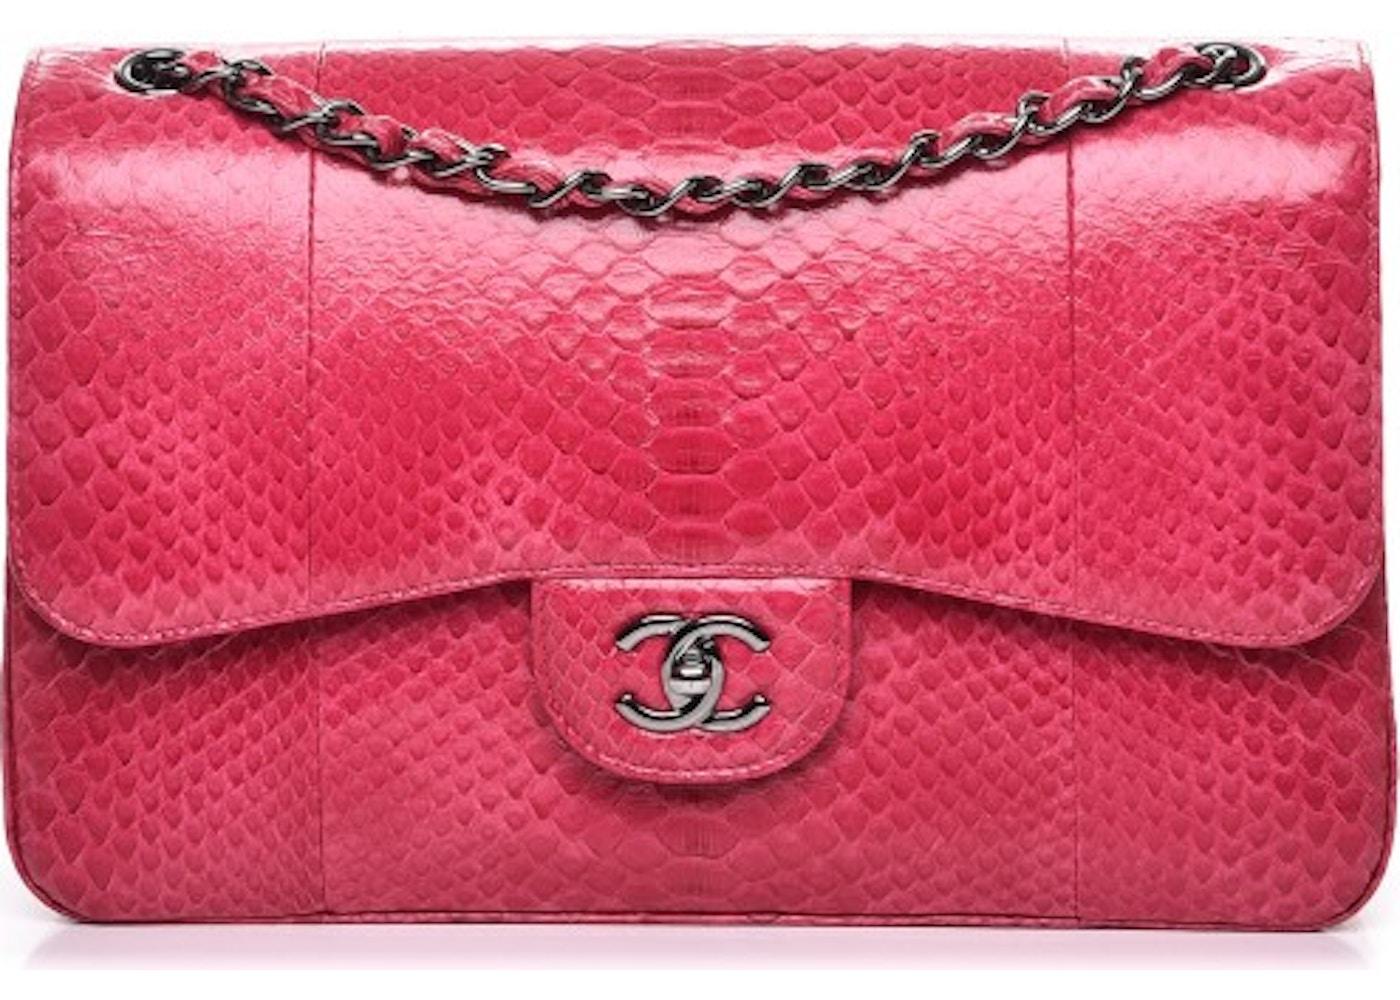 5bf87776696a Chanel Double Flap Jumbo Dark Pink. Jumbo Dark Pink